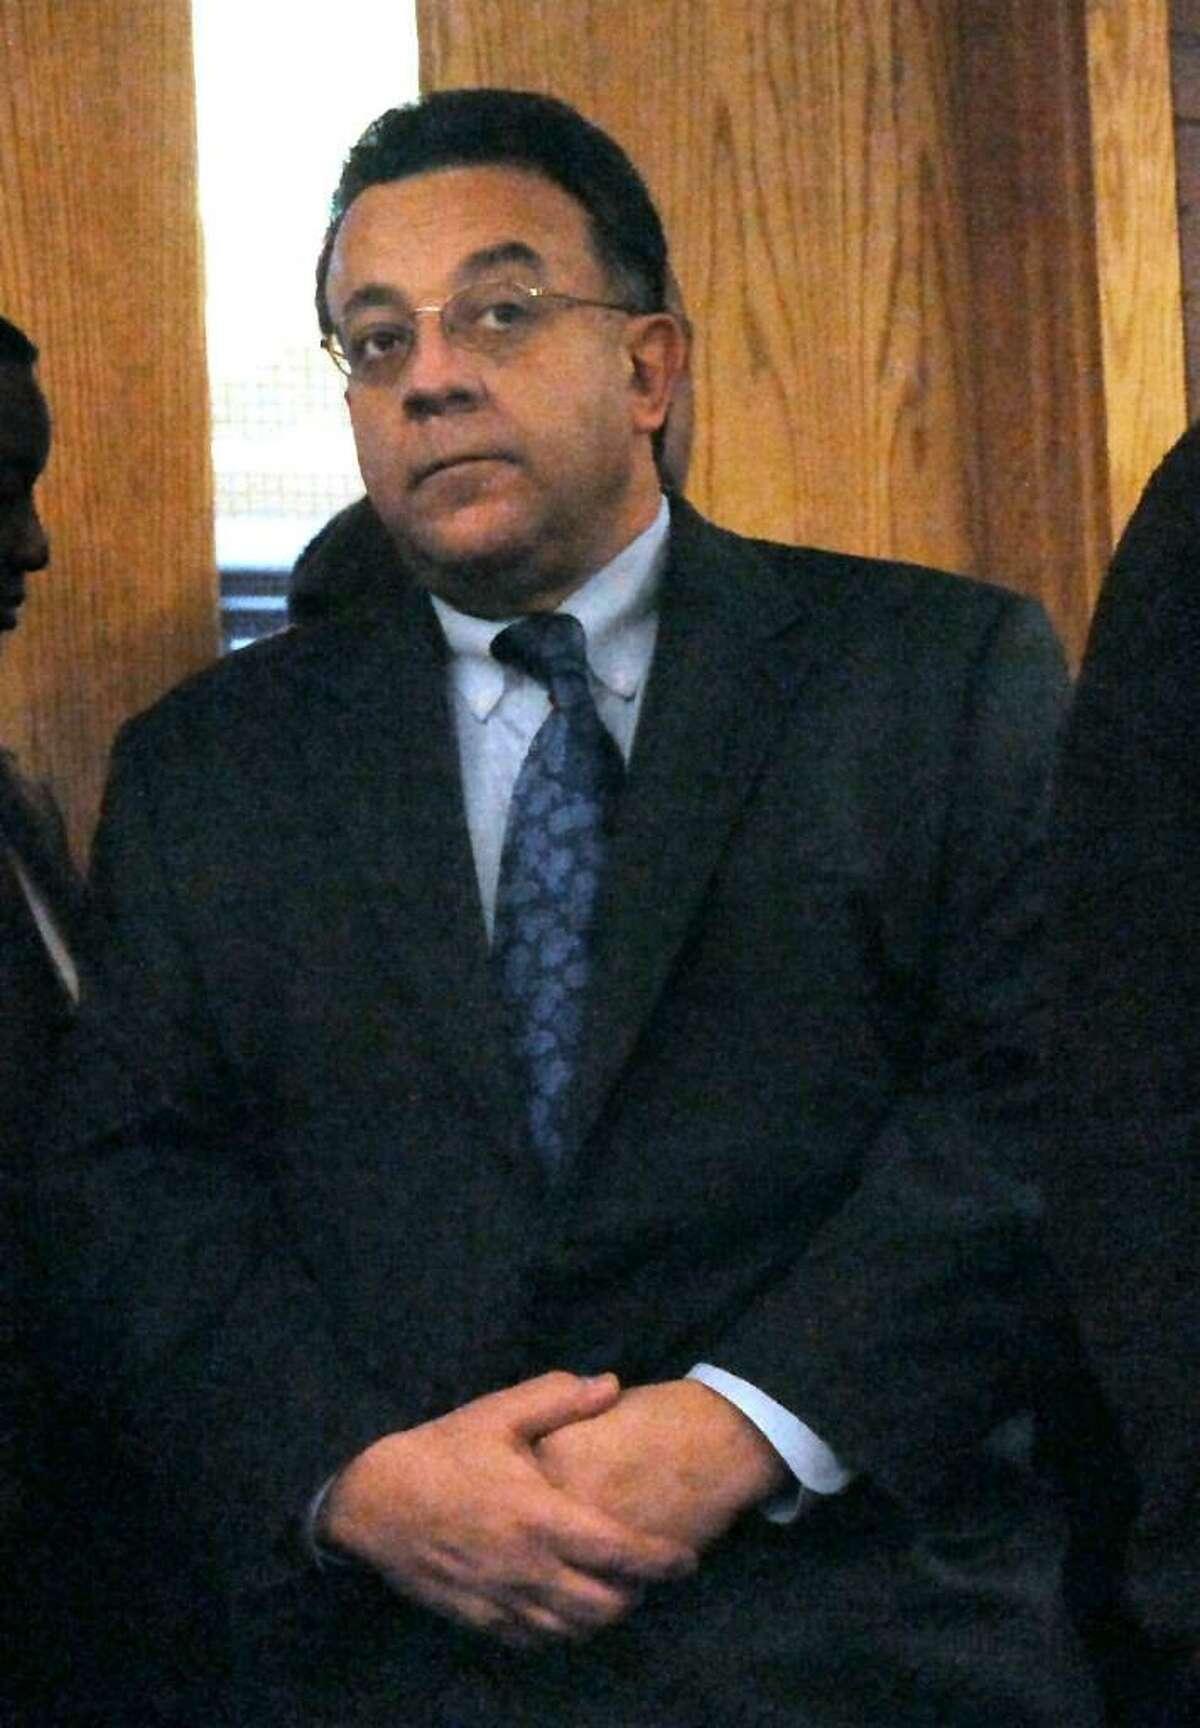 Joseph DaSilva Jr. waits in the courtroom of Danbury Superior Court, on Tuesday, Feb.9,2010.